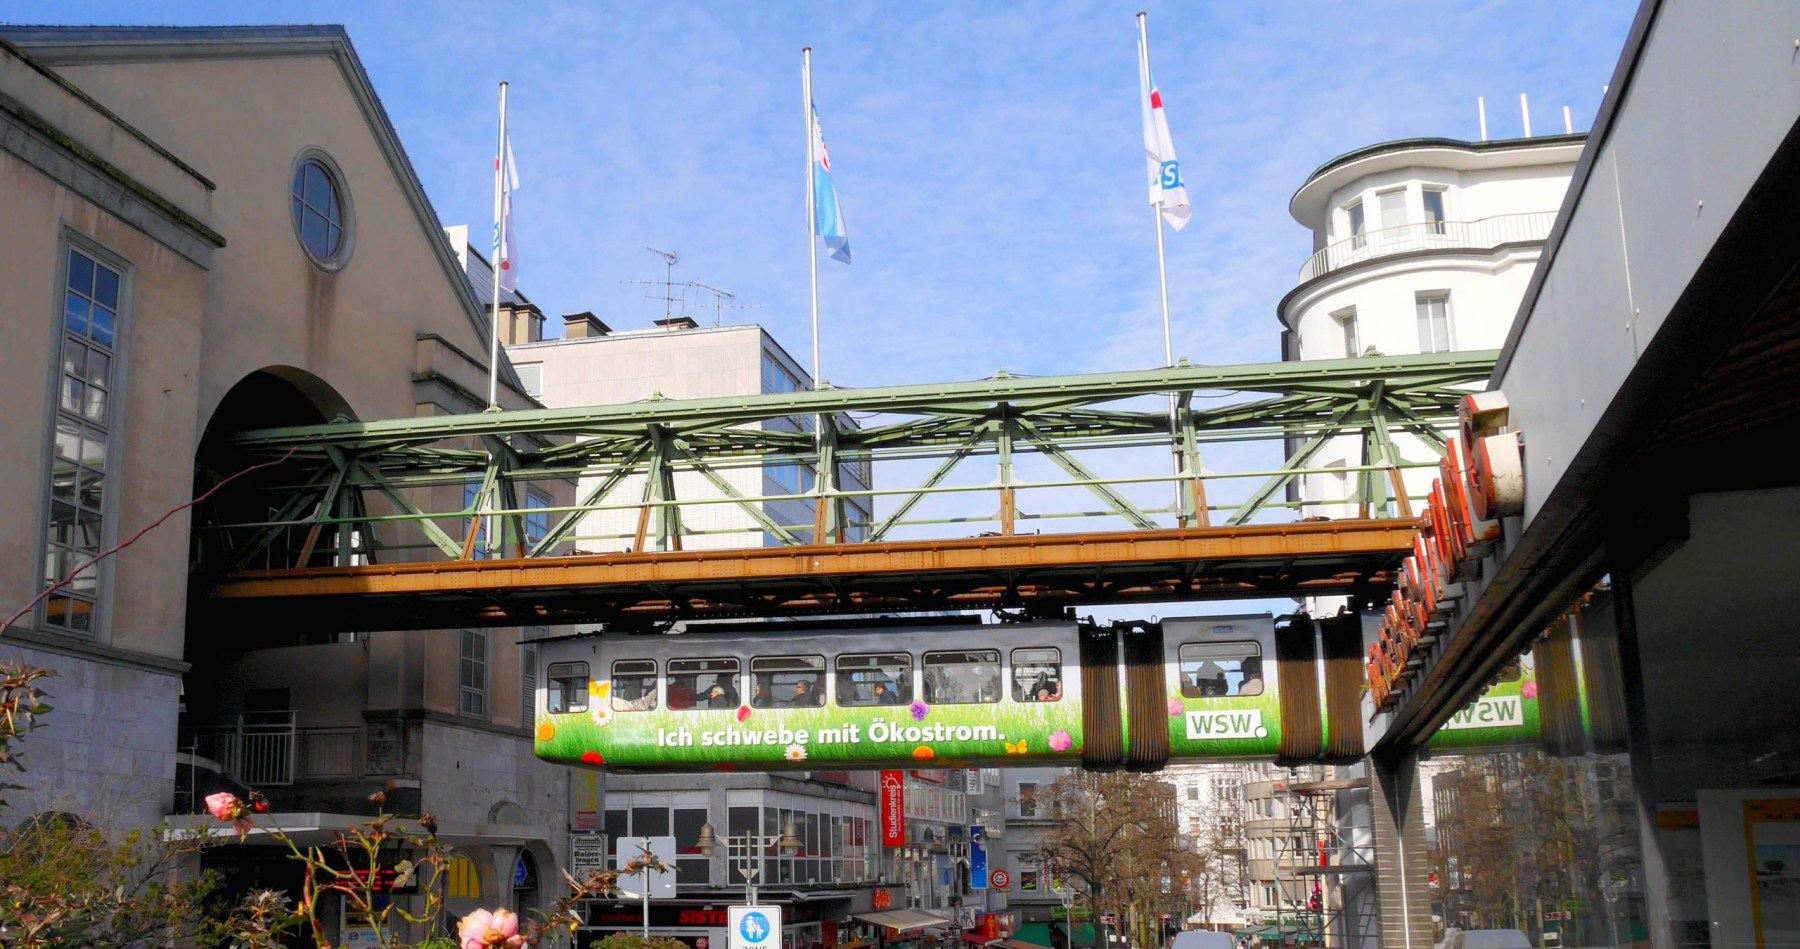 2014-02-14_185_Wuppertal_Alte-Freiheit-scaled